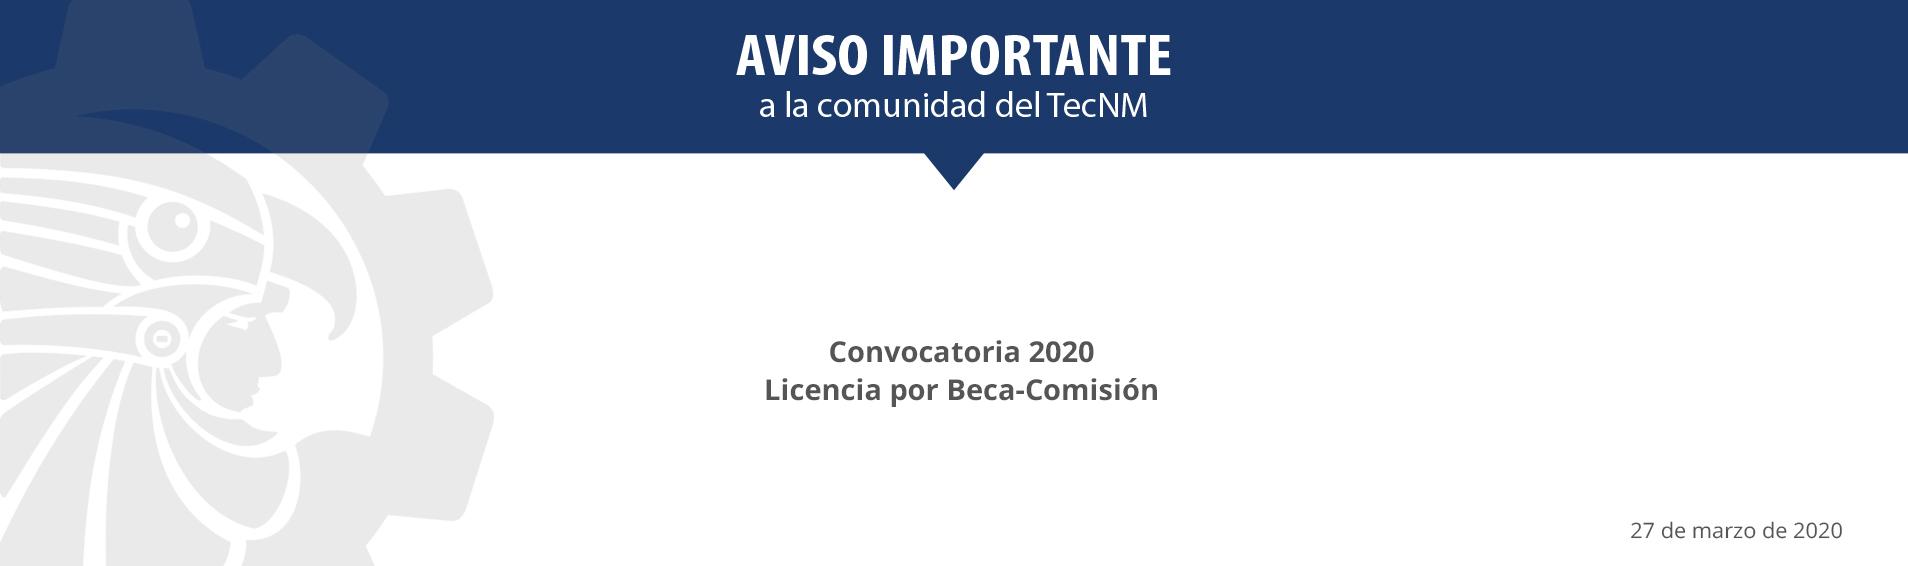 conv_licencia_beca_comision20200327